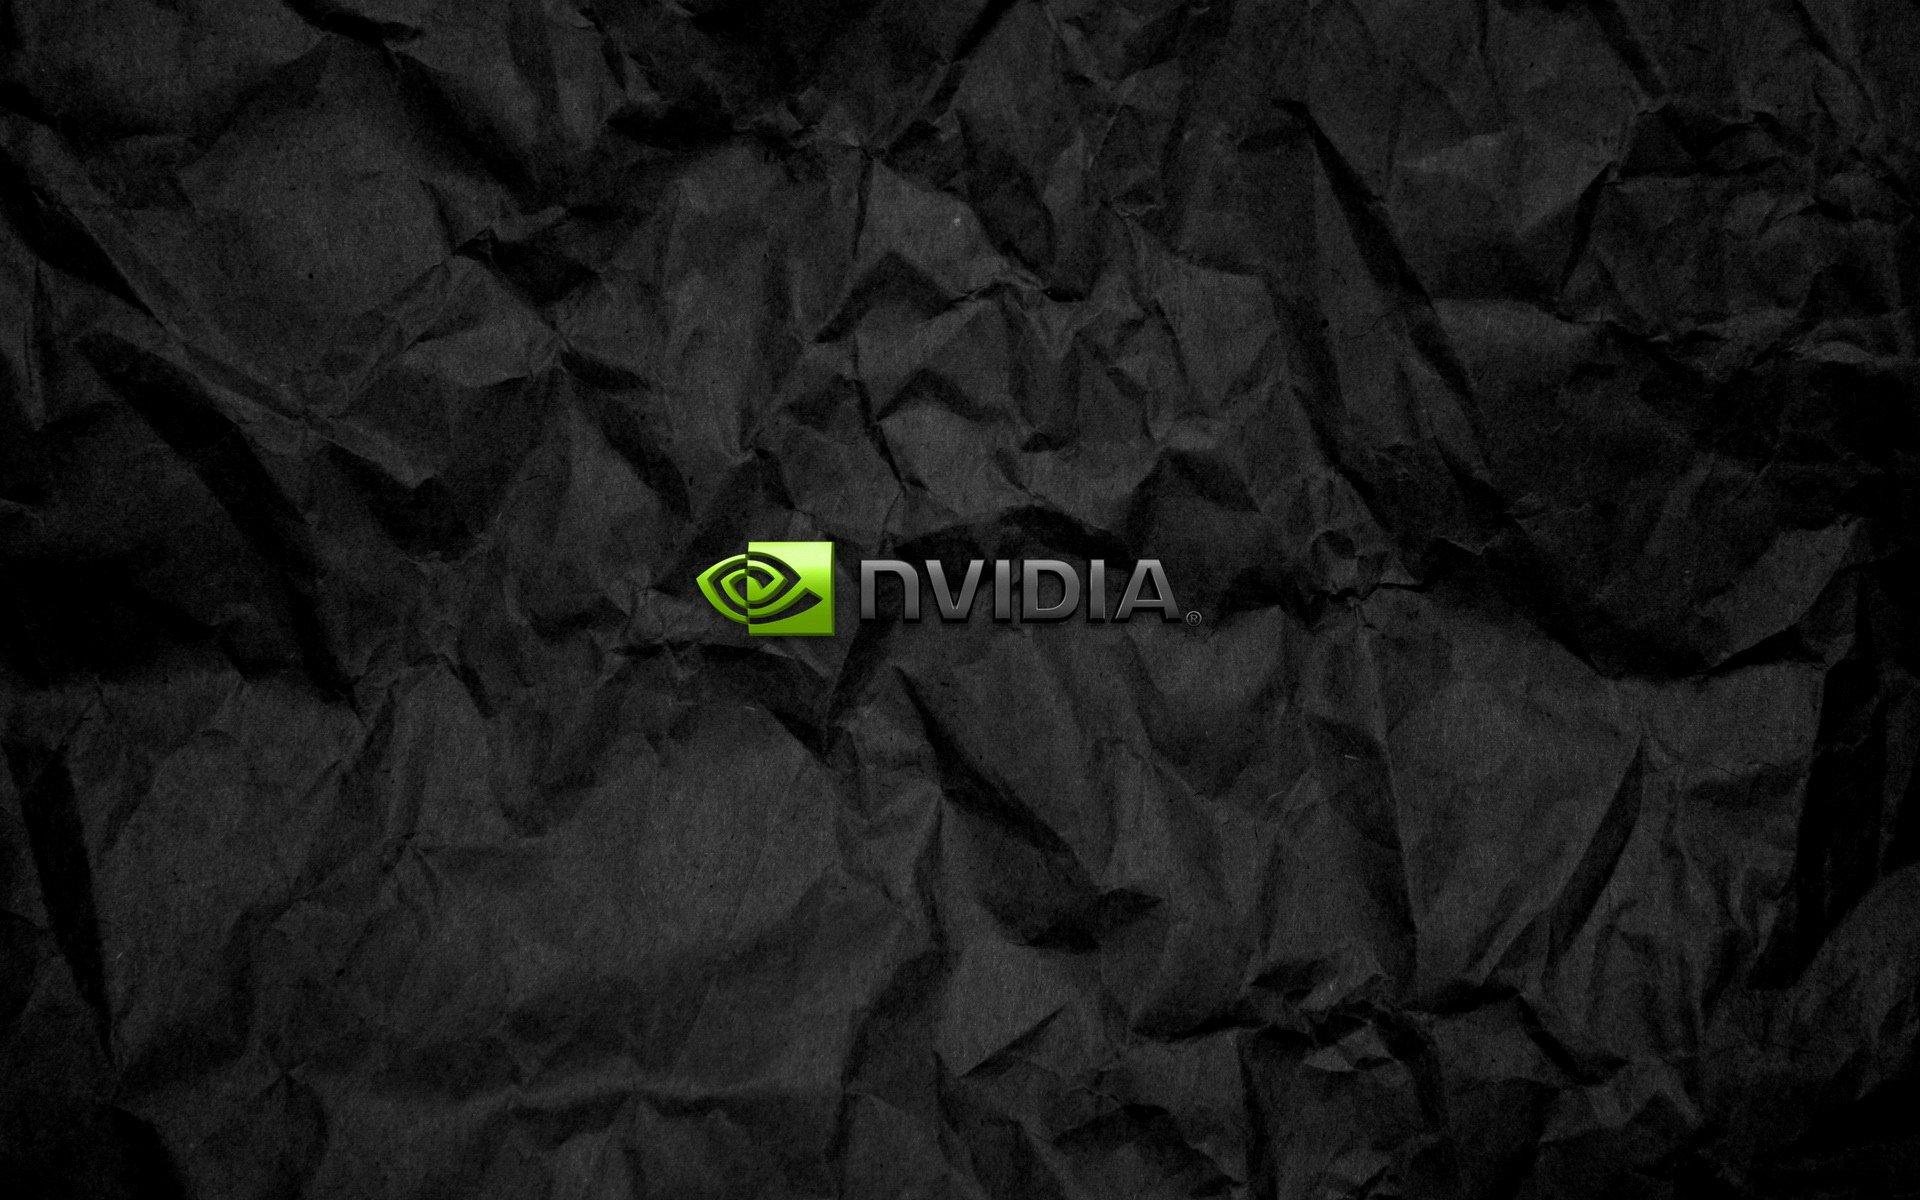 Nvidia full hd wallpaper and background image 1920x1200 - 1920x1080 wallpaper nvidia ...